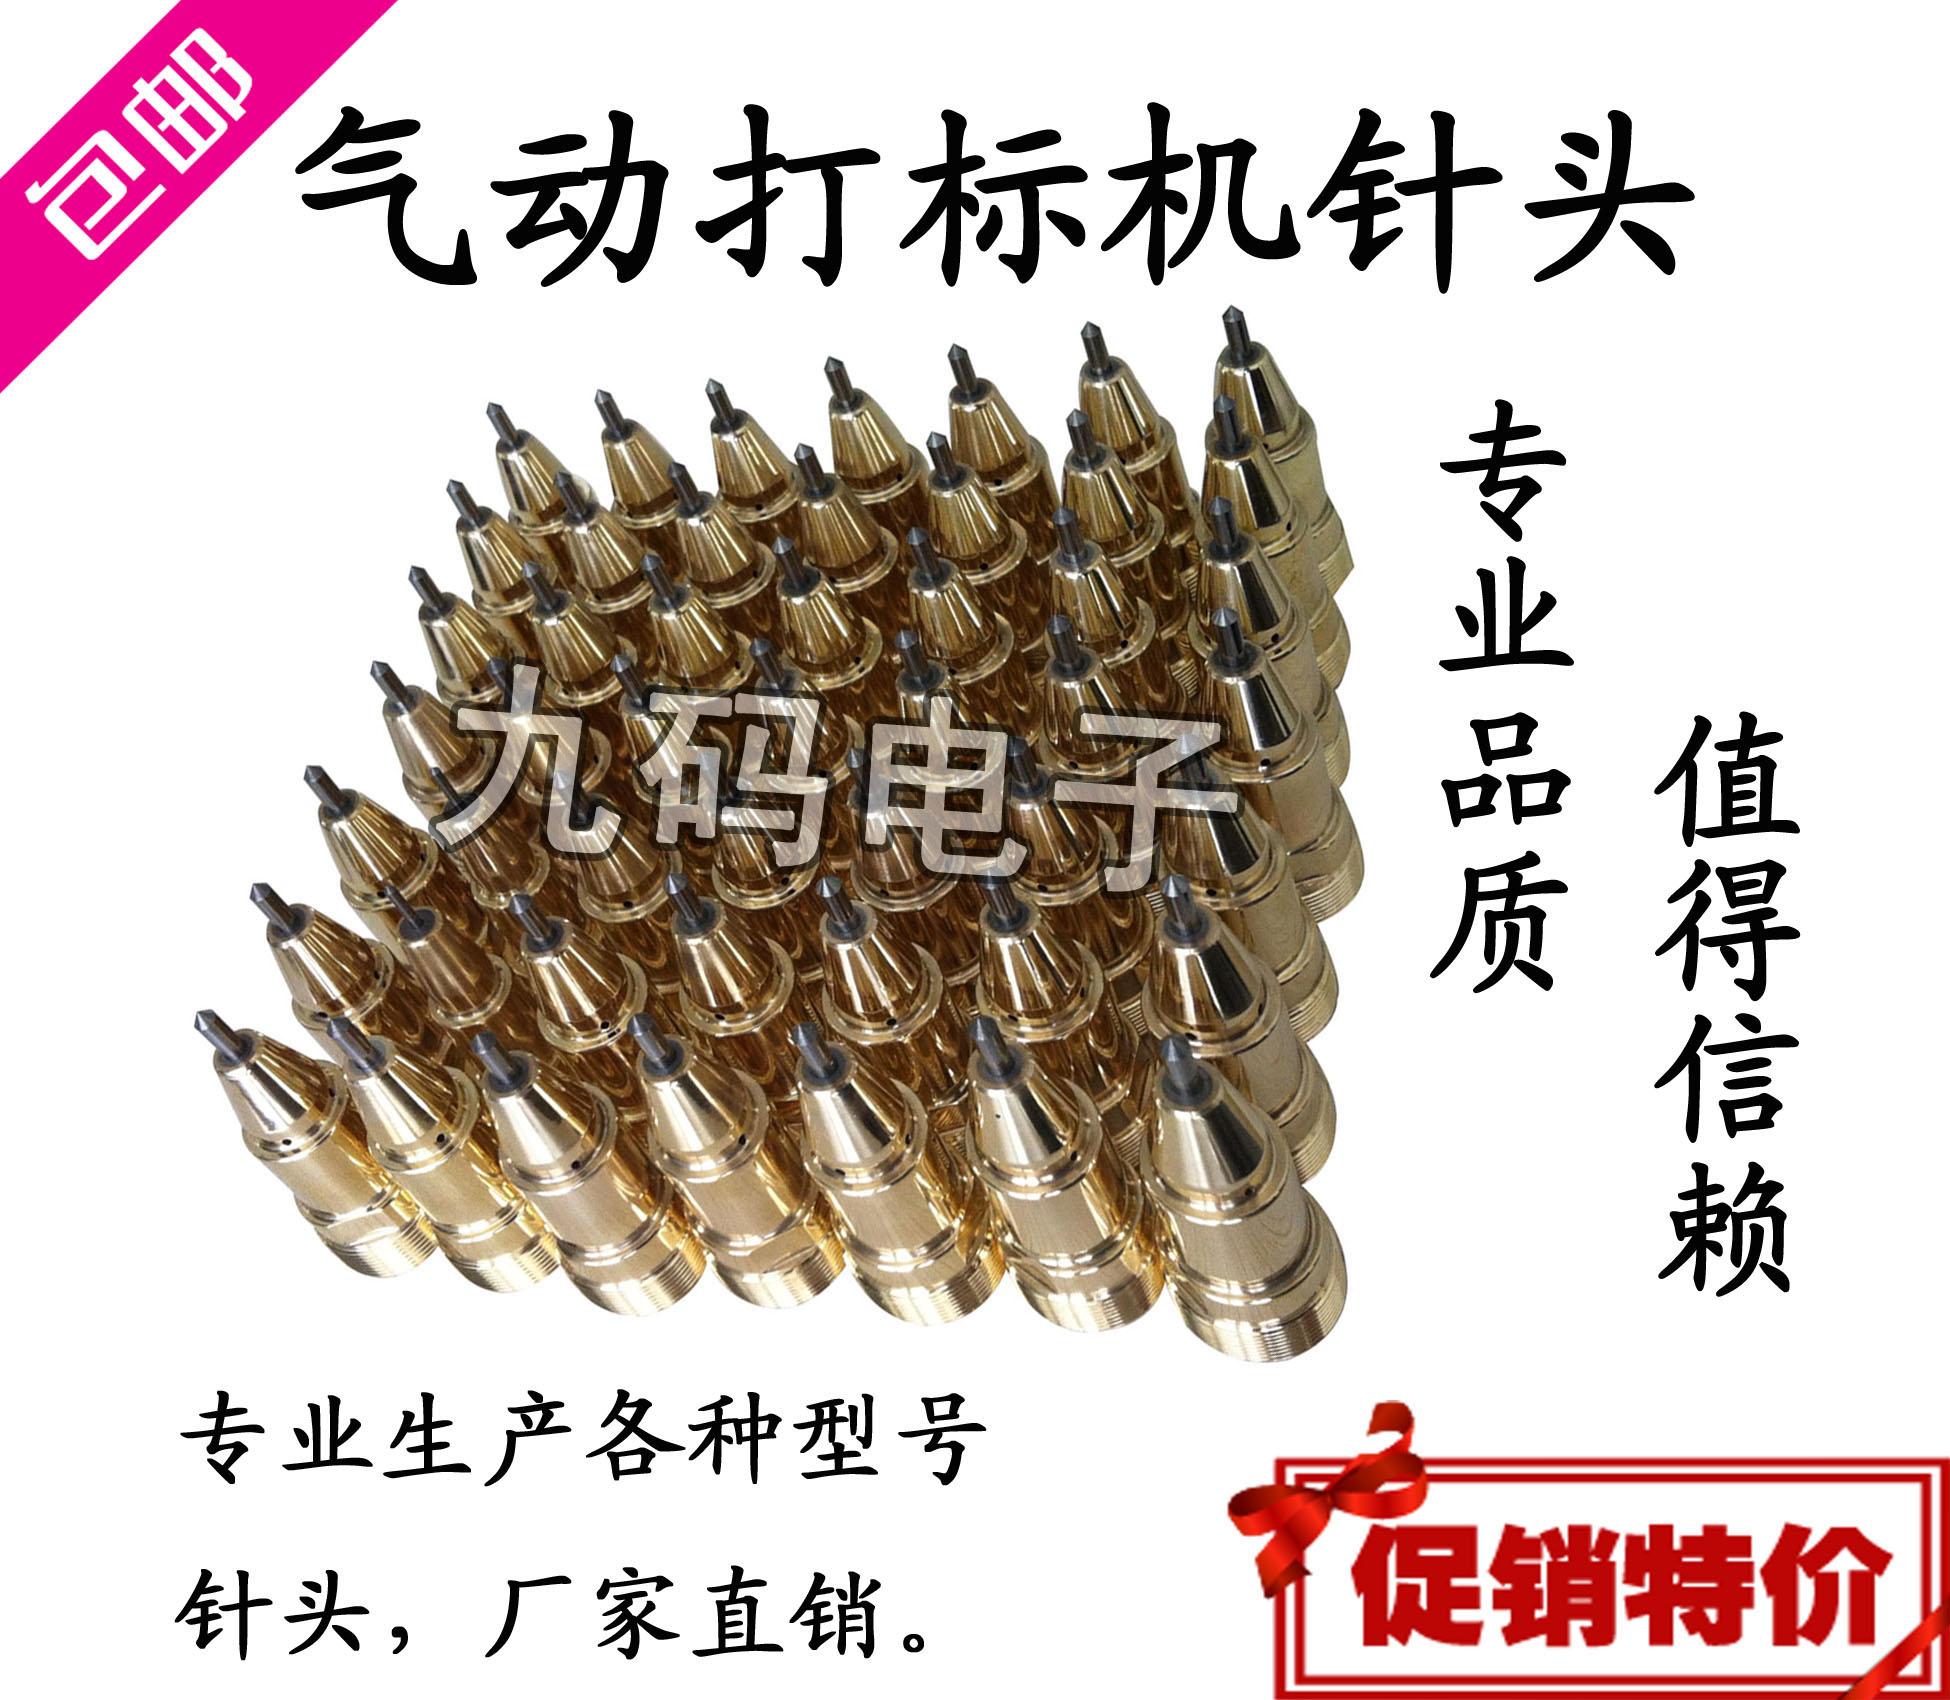 proizvajalci prodajo pnevmatski odtis iglo elektronsko označevanje iglo pnevmatski glavo pnevmatskega koda za iglo